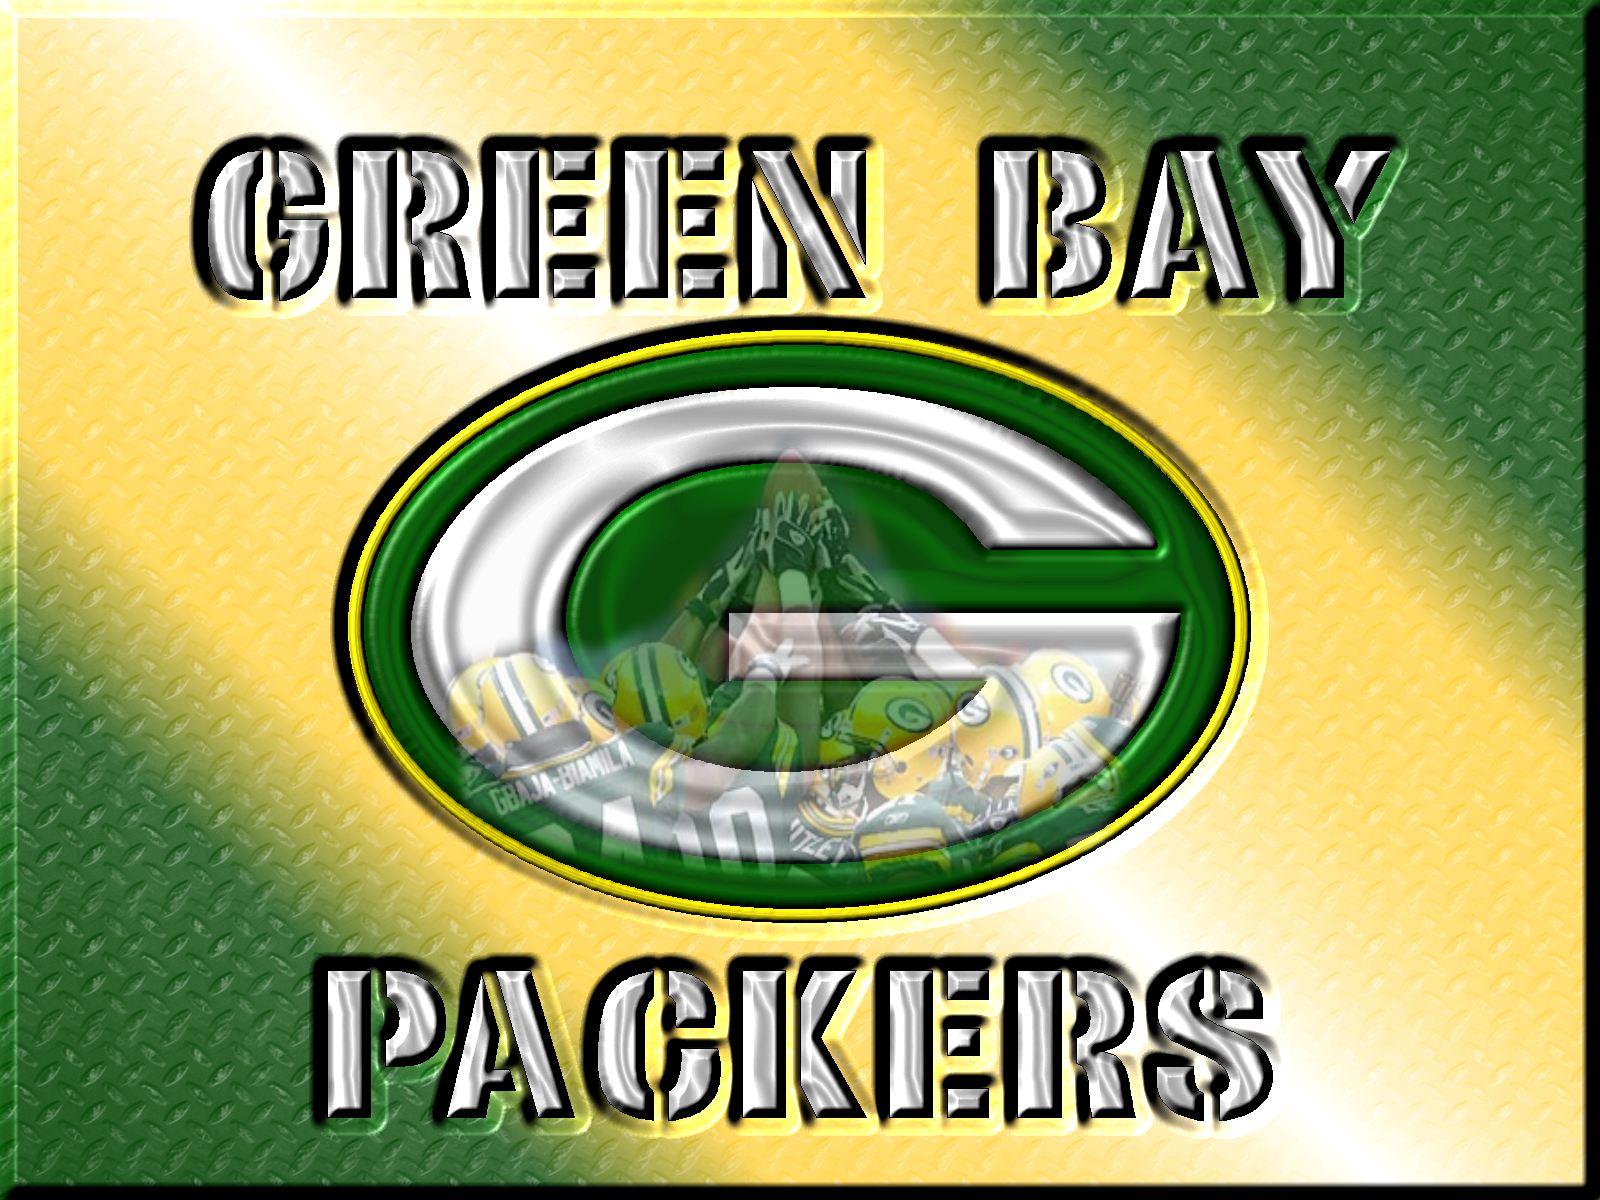 GREEN BAY PACKERS Nfl Football R Wallpaper